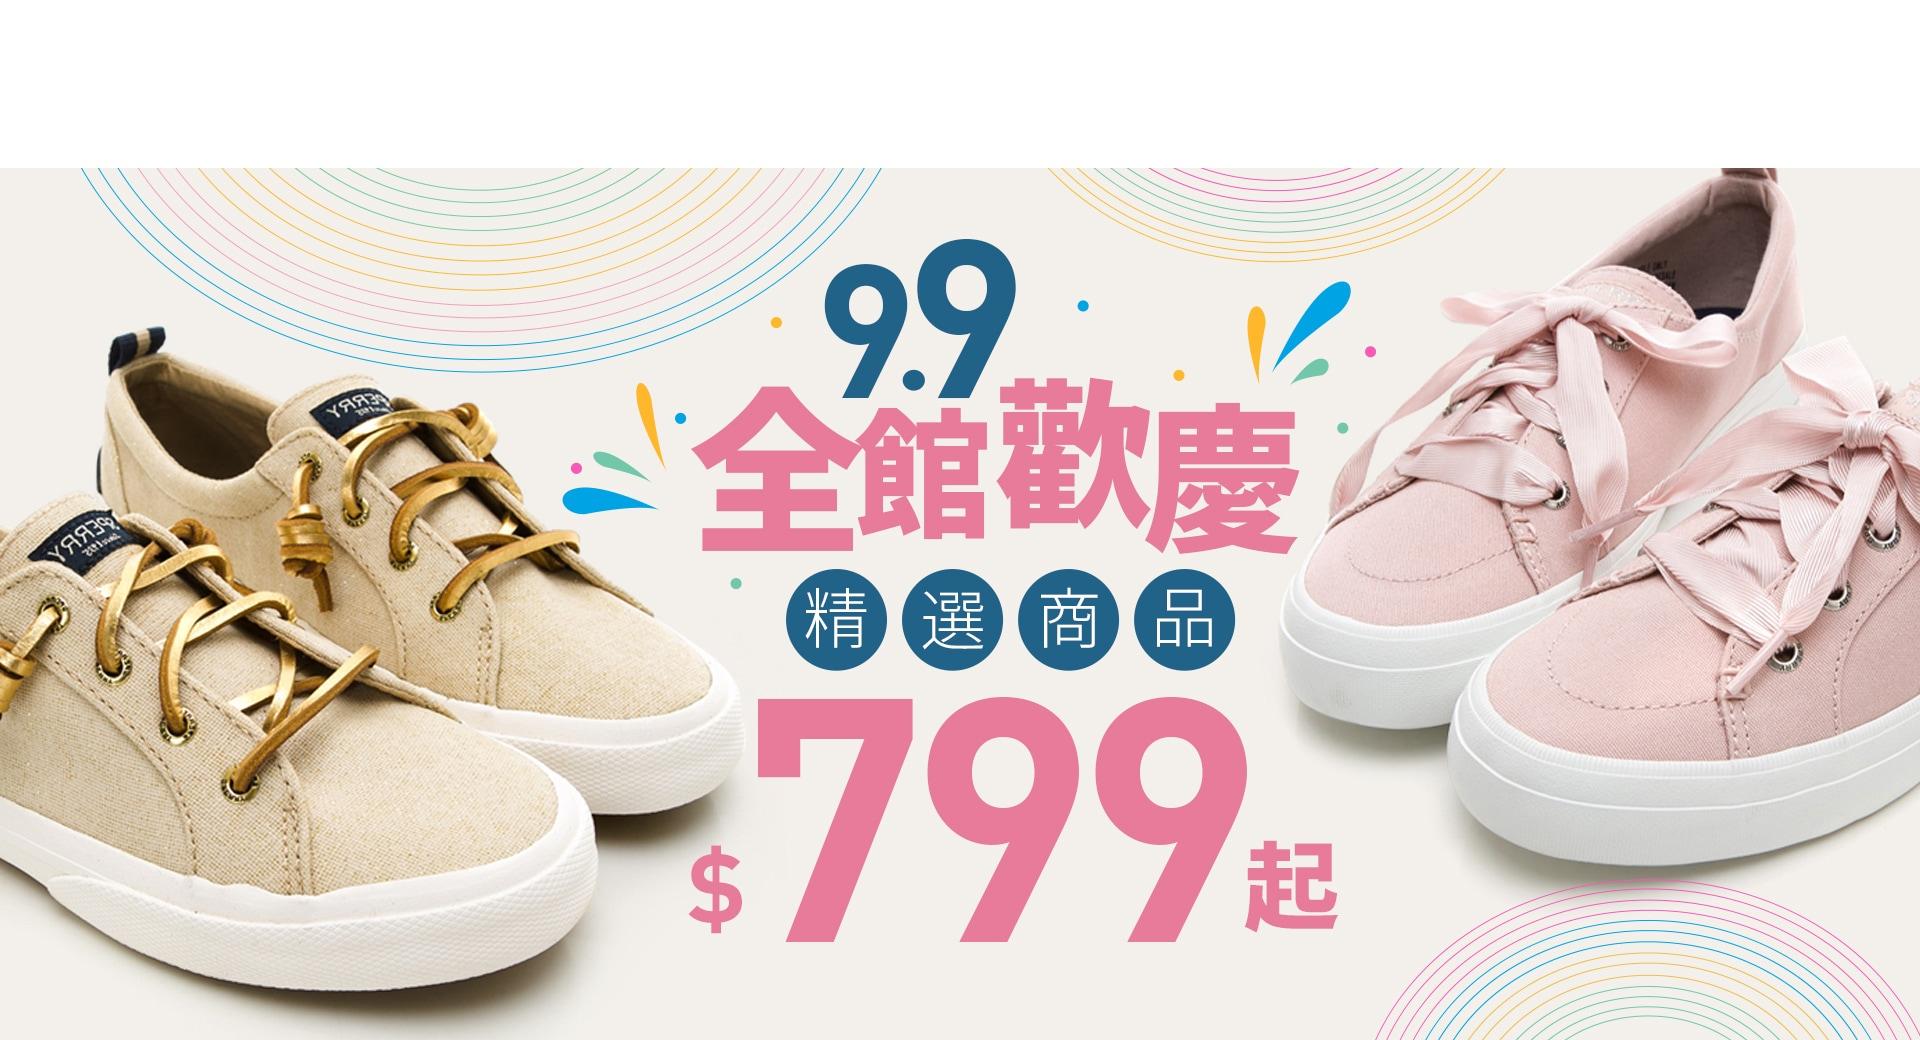 SPERRY 台灣官方購物網站